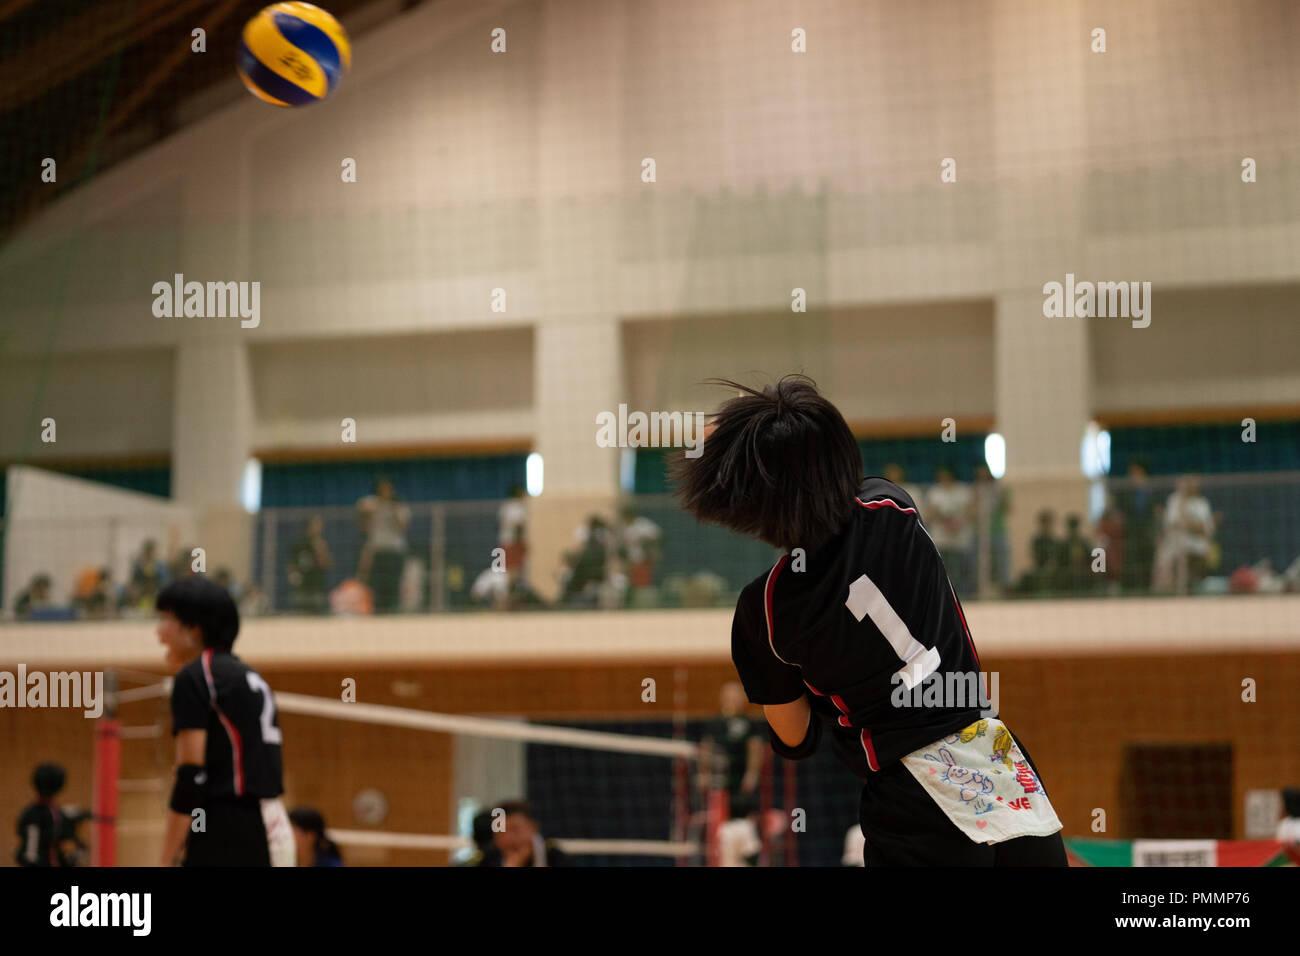 Volleyball (Junior High School Student) - Stock Image